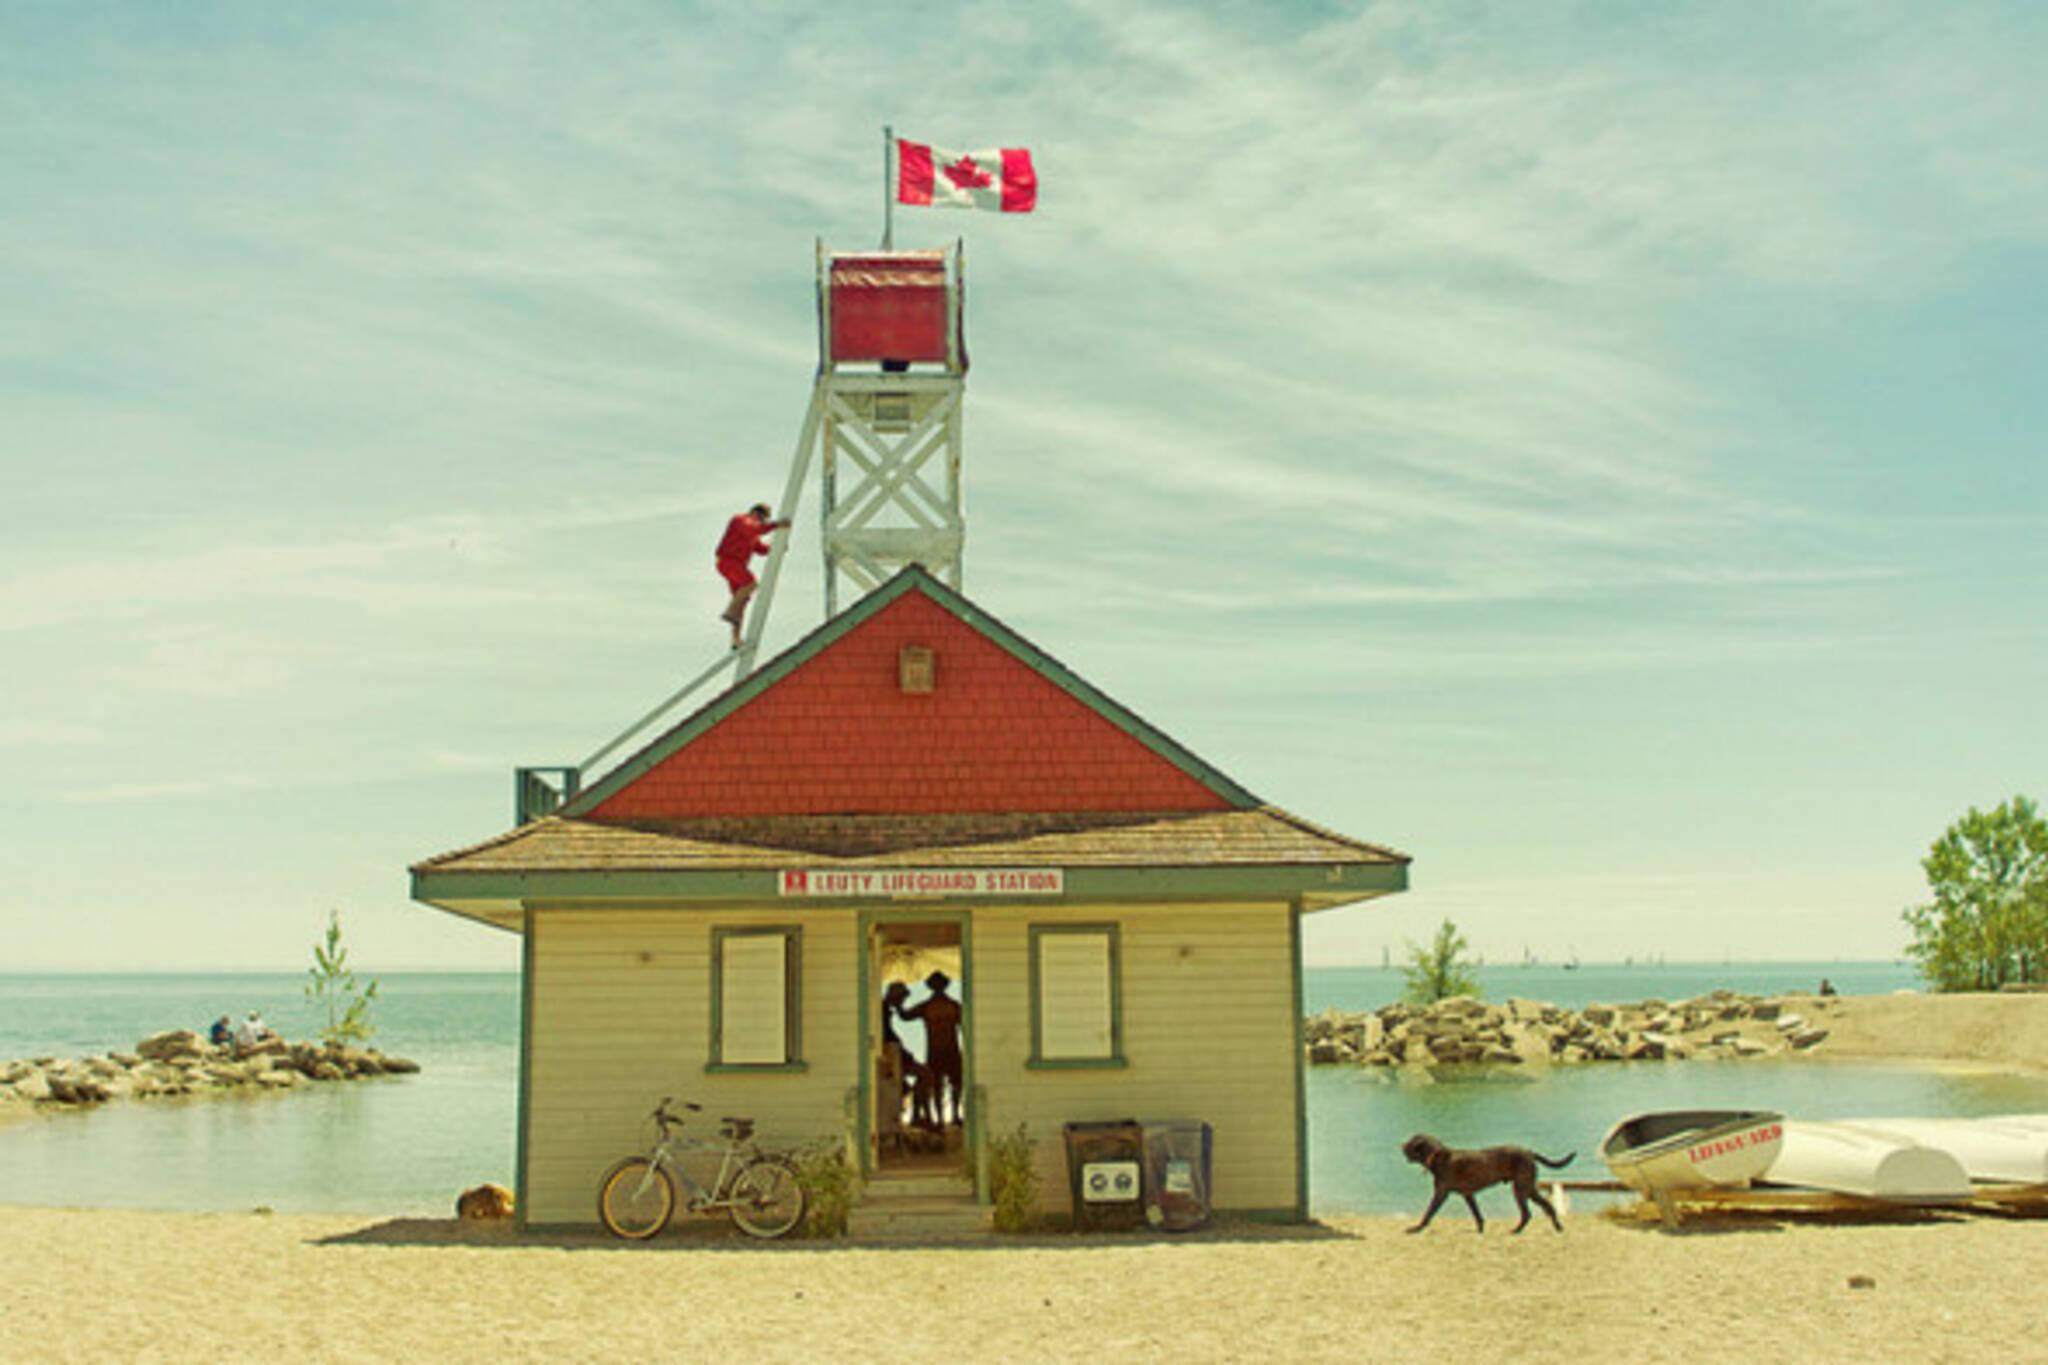 Leuty Lifeguard Station